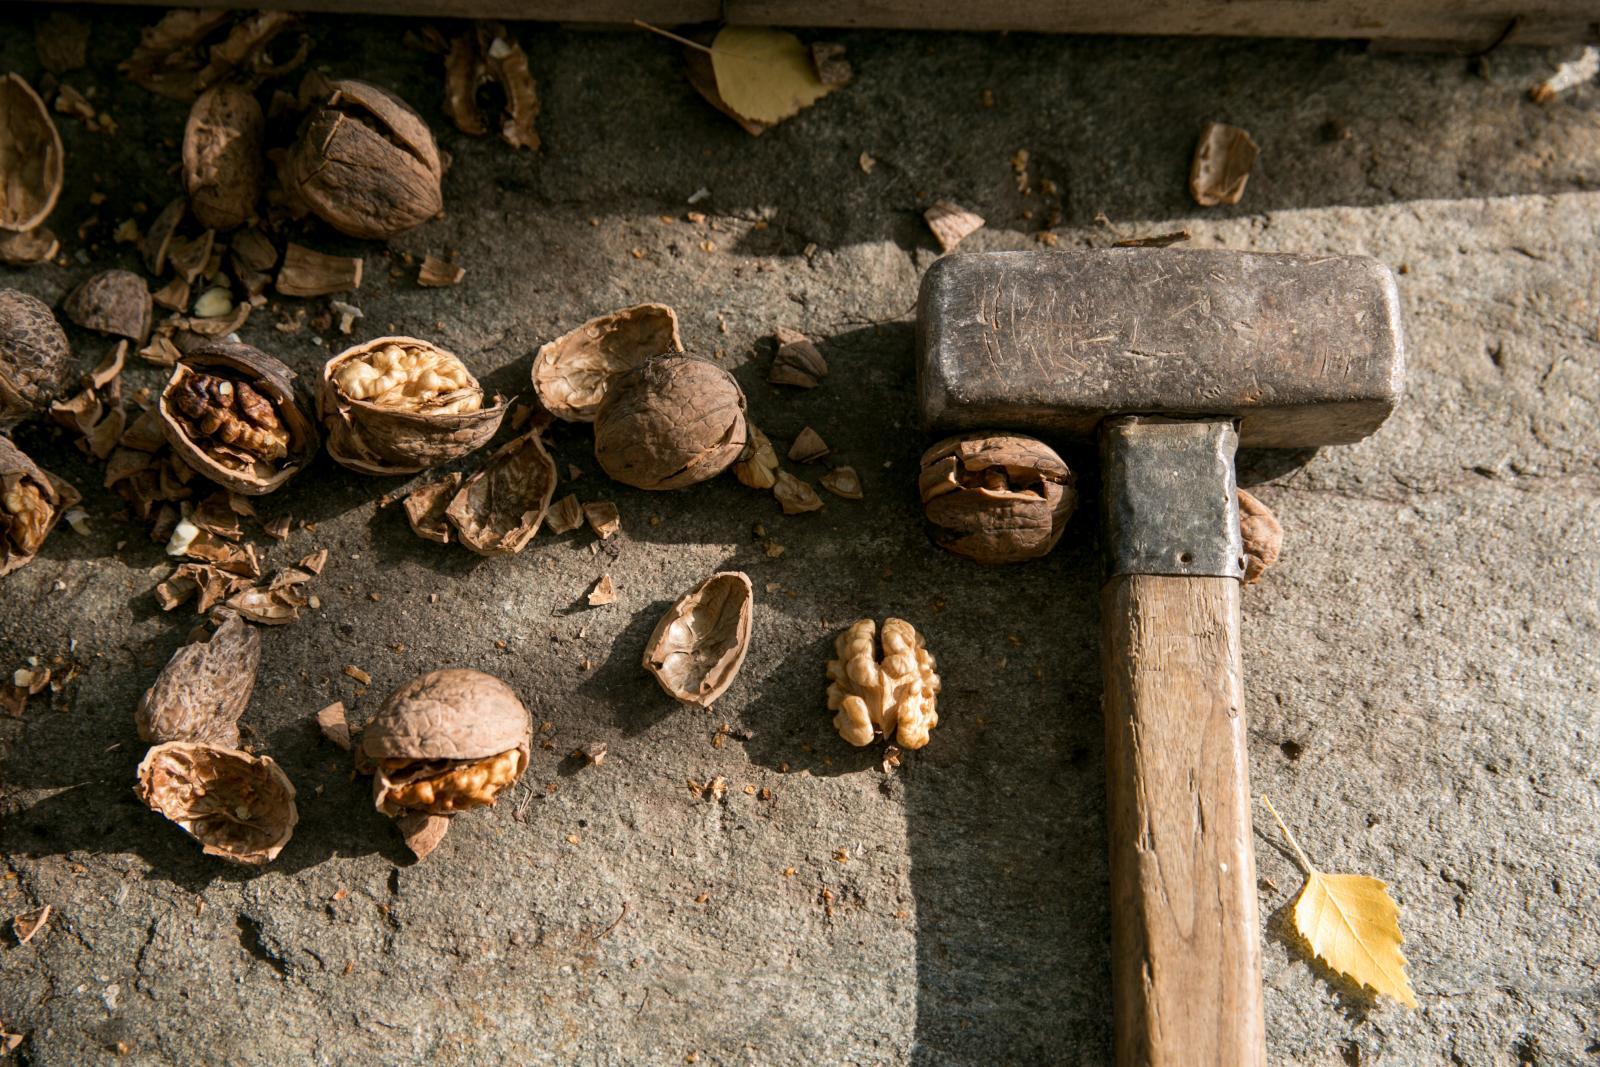 Orašasti plodovi, a posebno orah, povoljno djeluju na naše zdravlje.